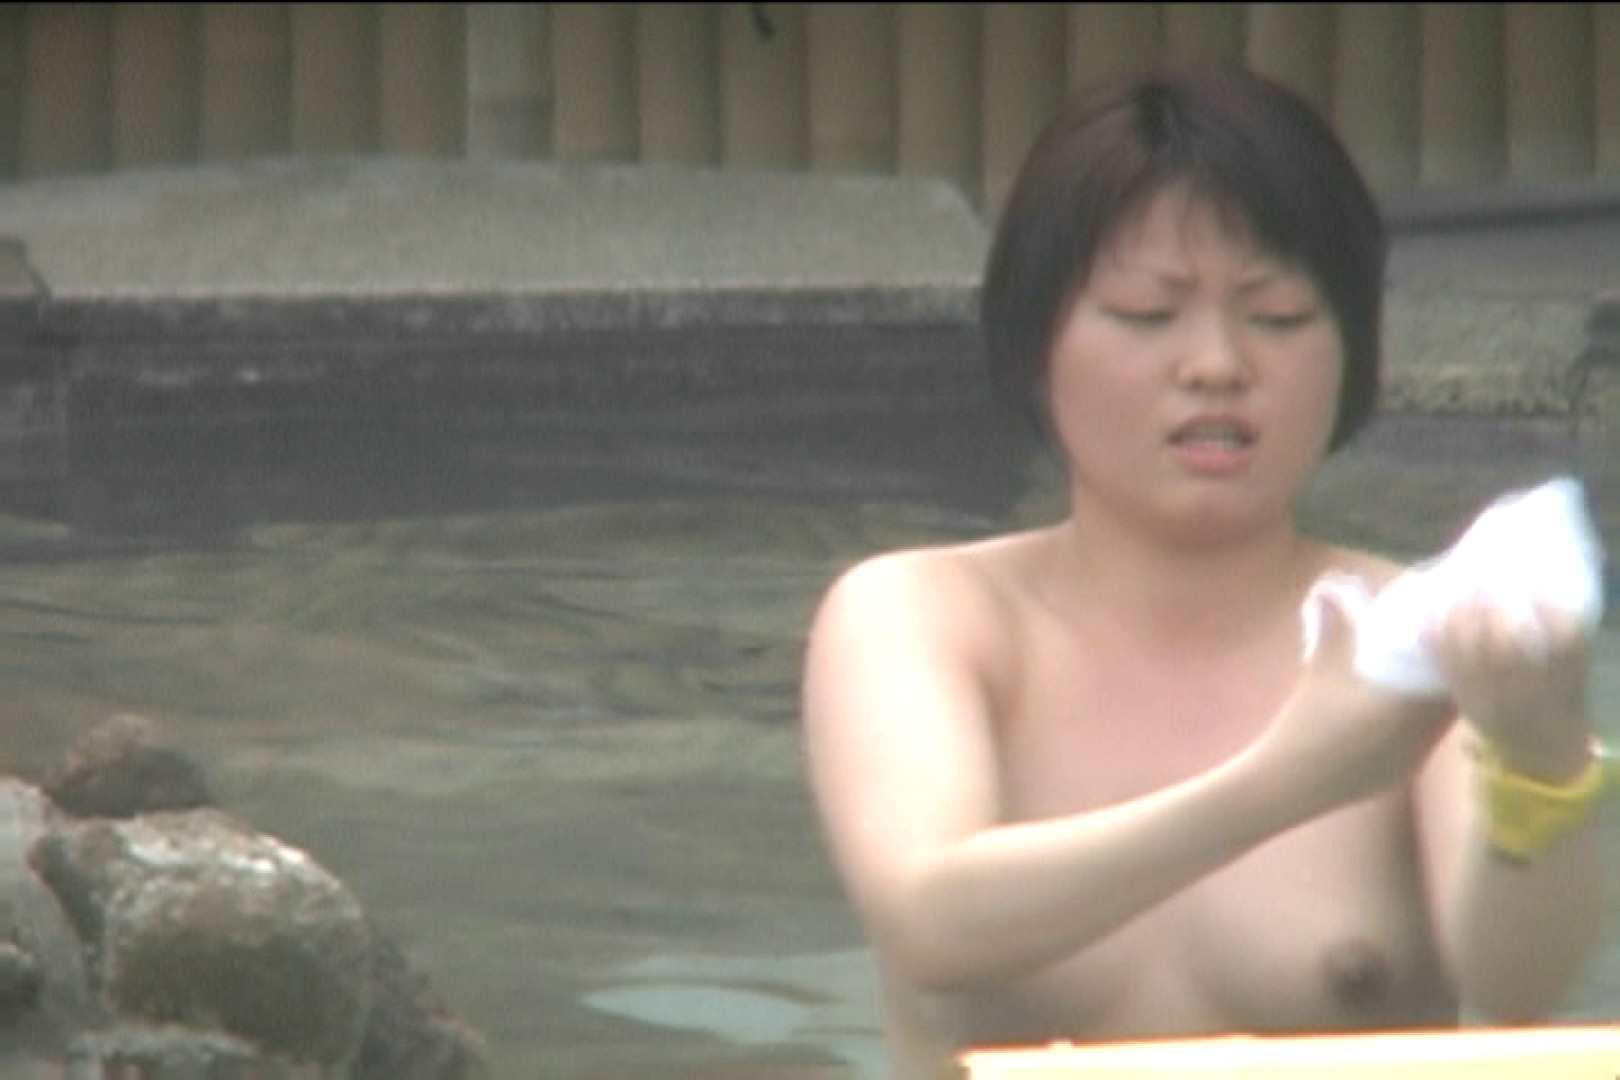 Aquaな露天風呂Vol.141 盗撮   OLエロ画像  22PICs 16